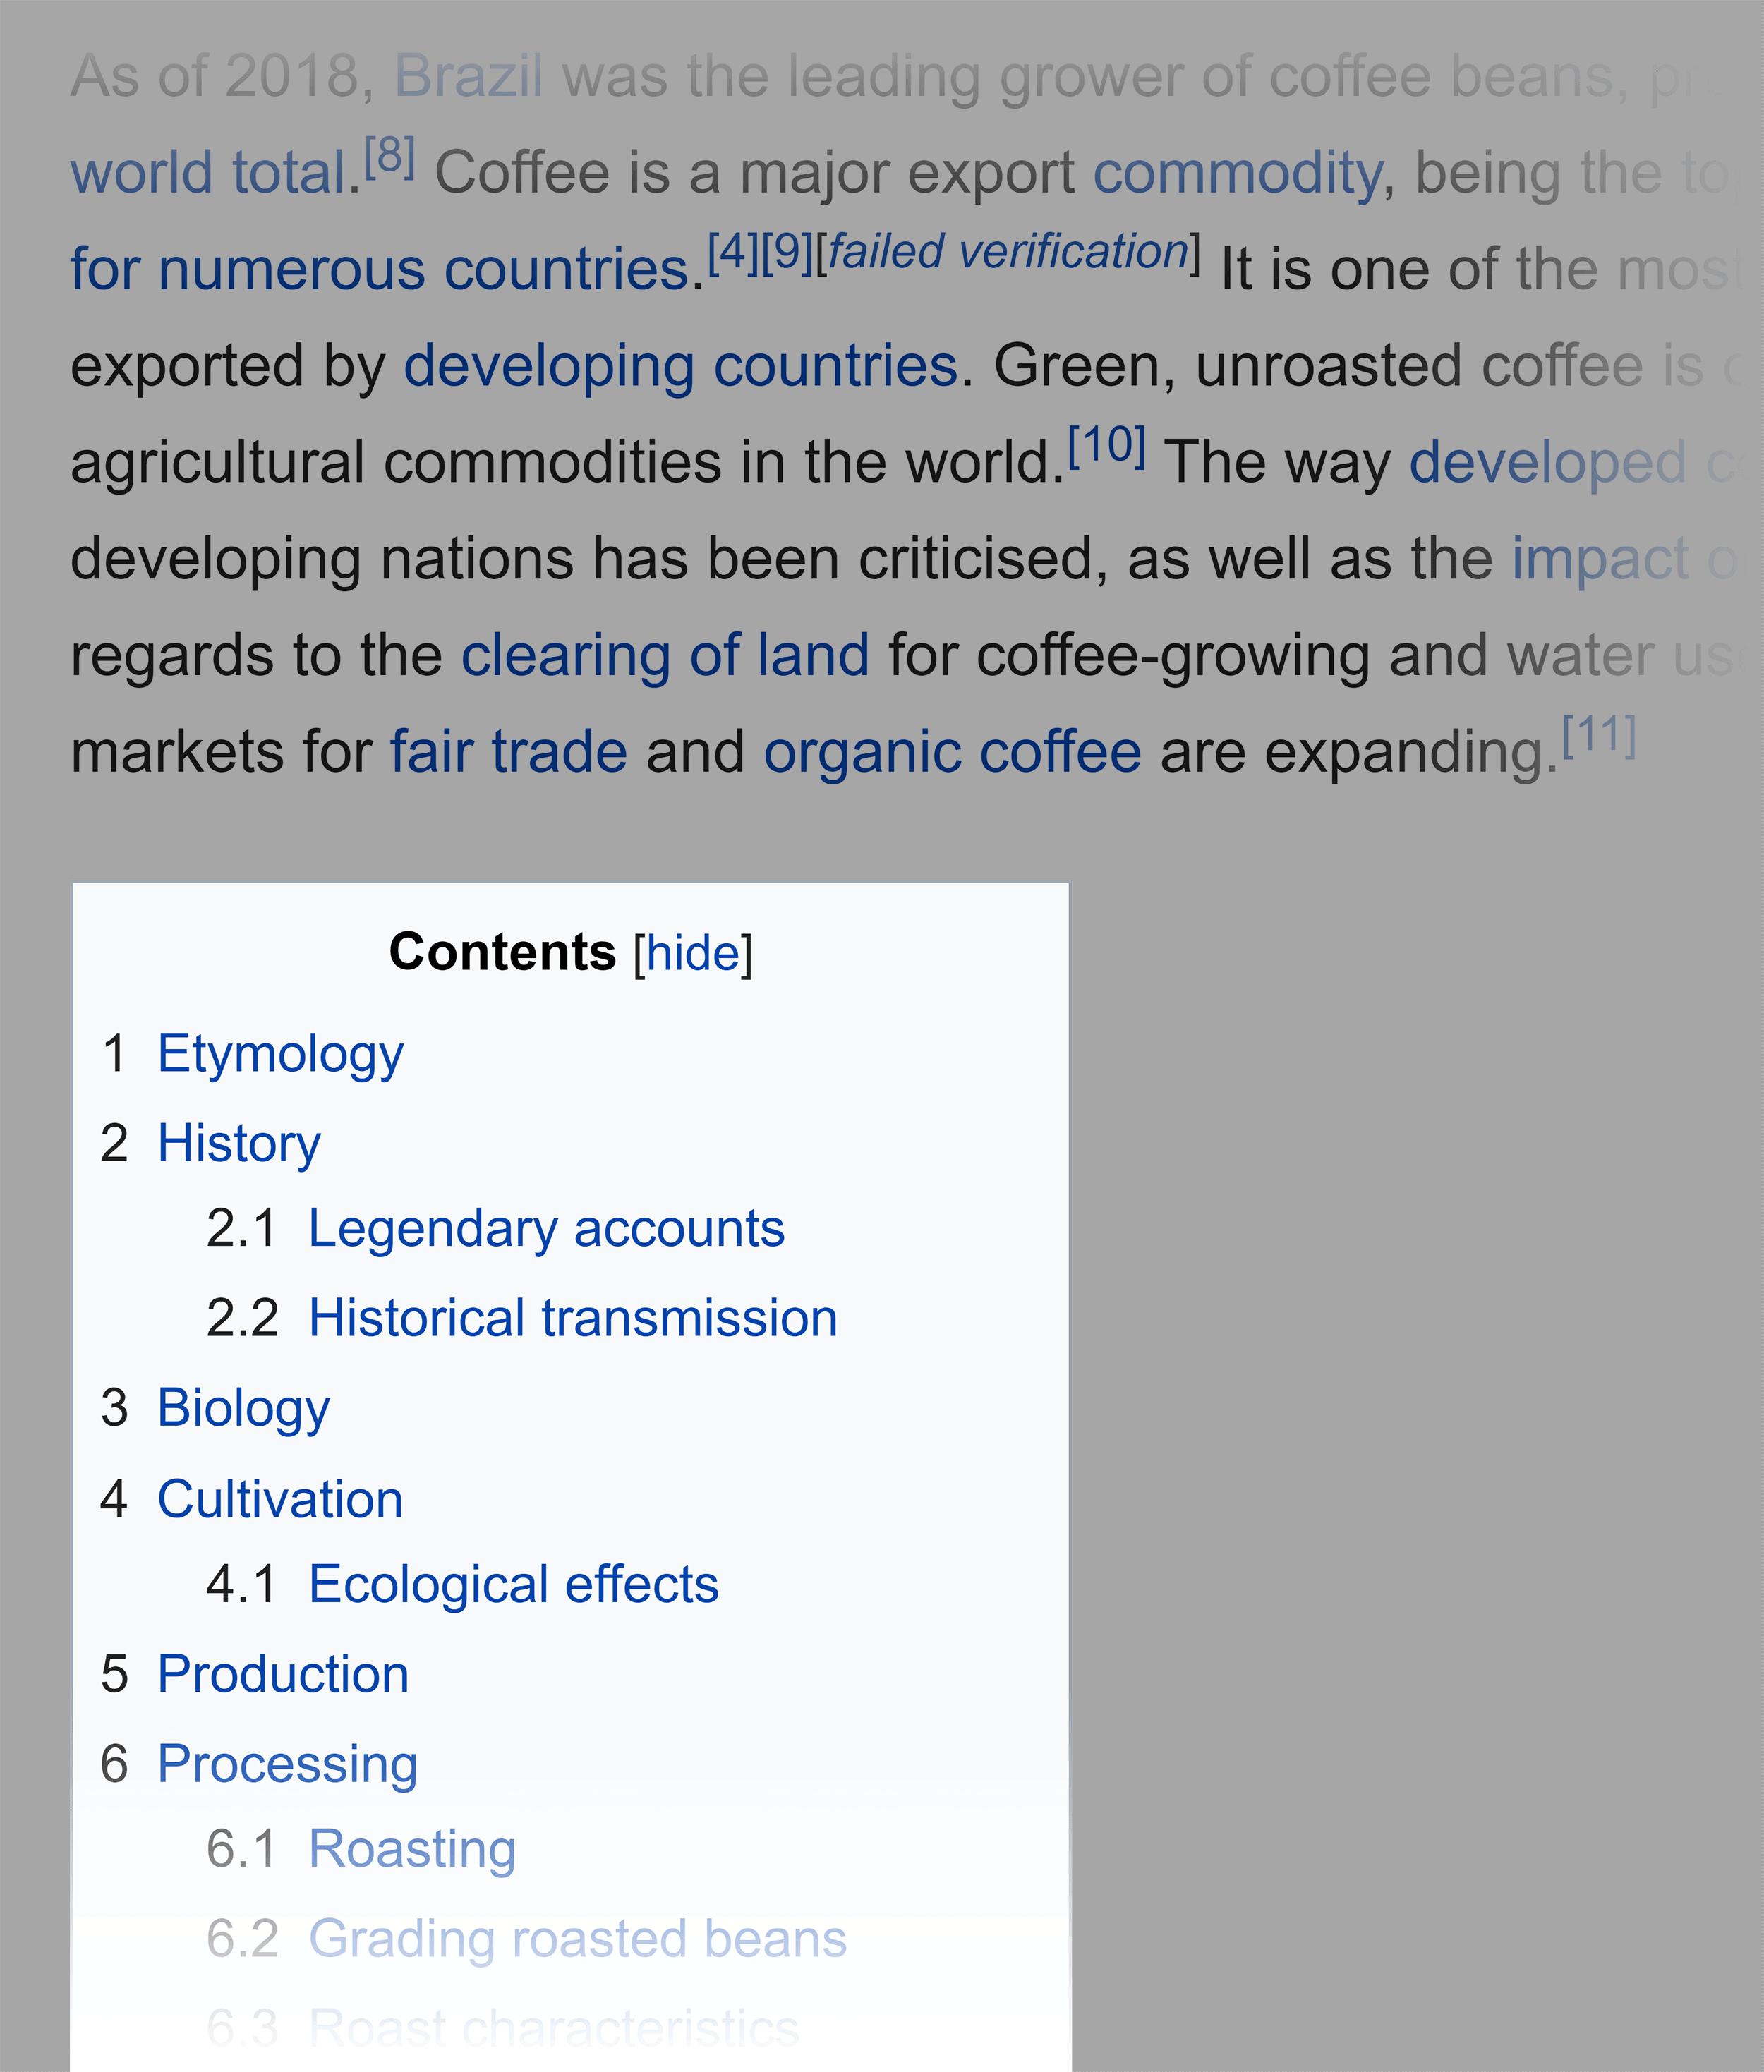 Wikipedia – Contents